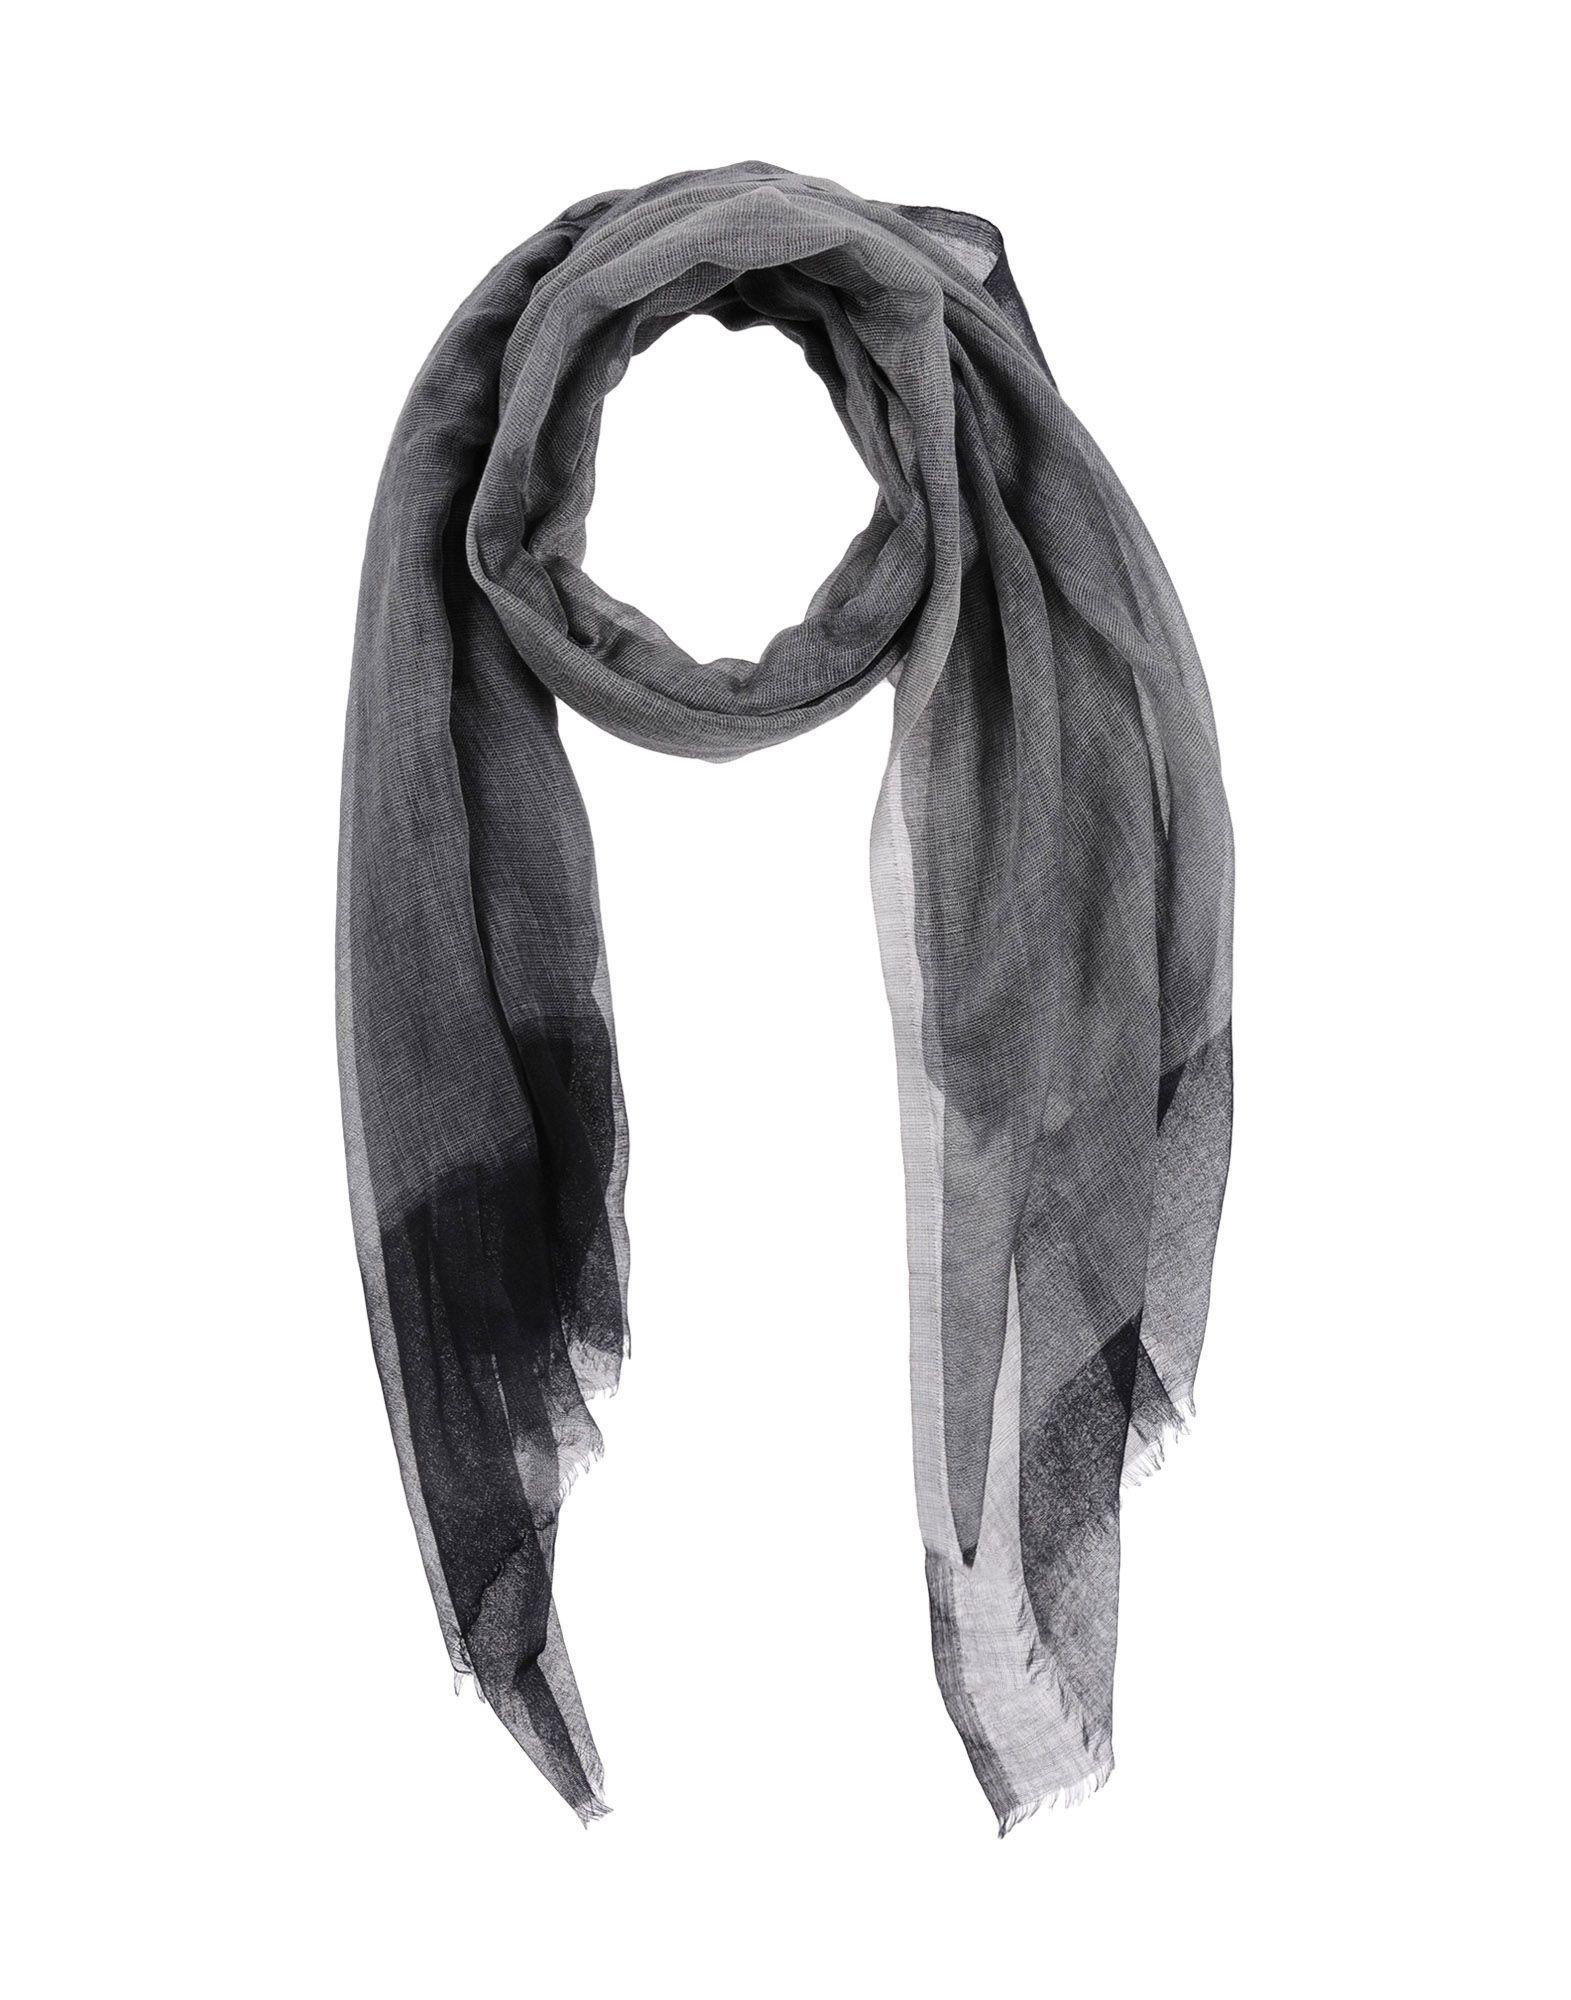 ACCESSORIES - Oblong scarves Bottega Veneta yunow